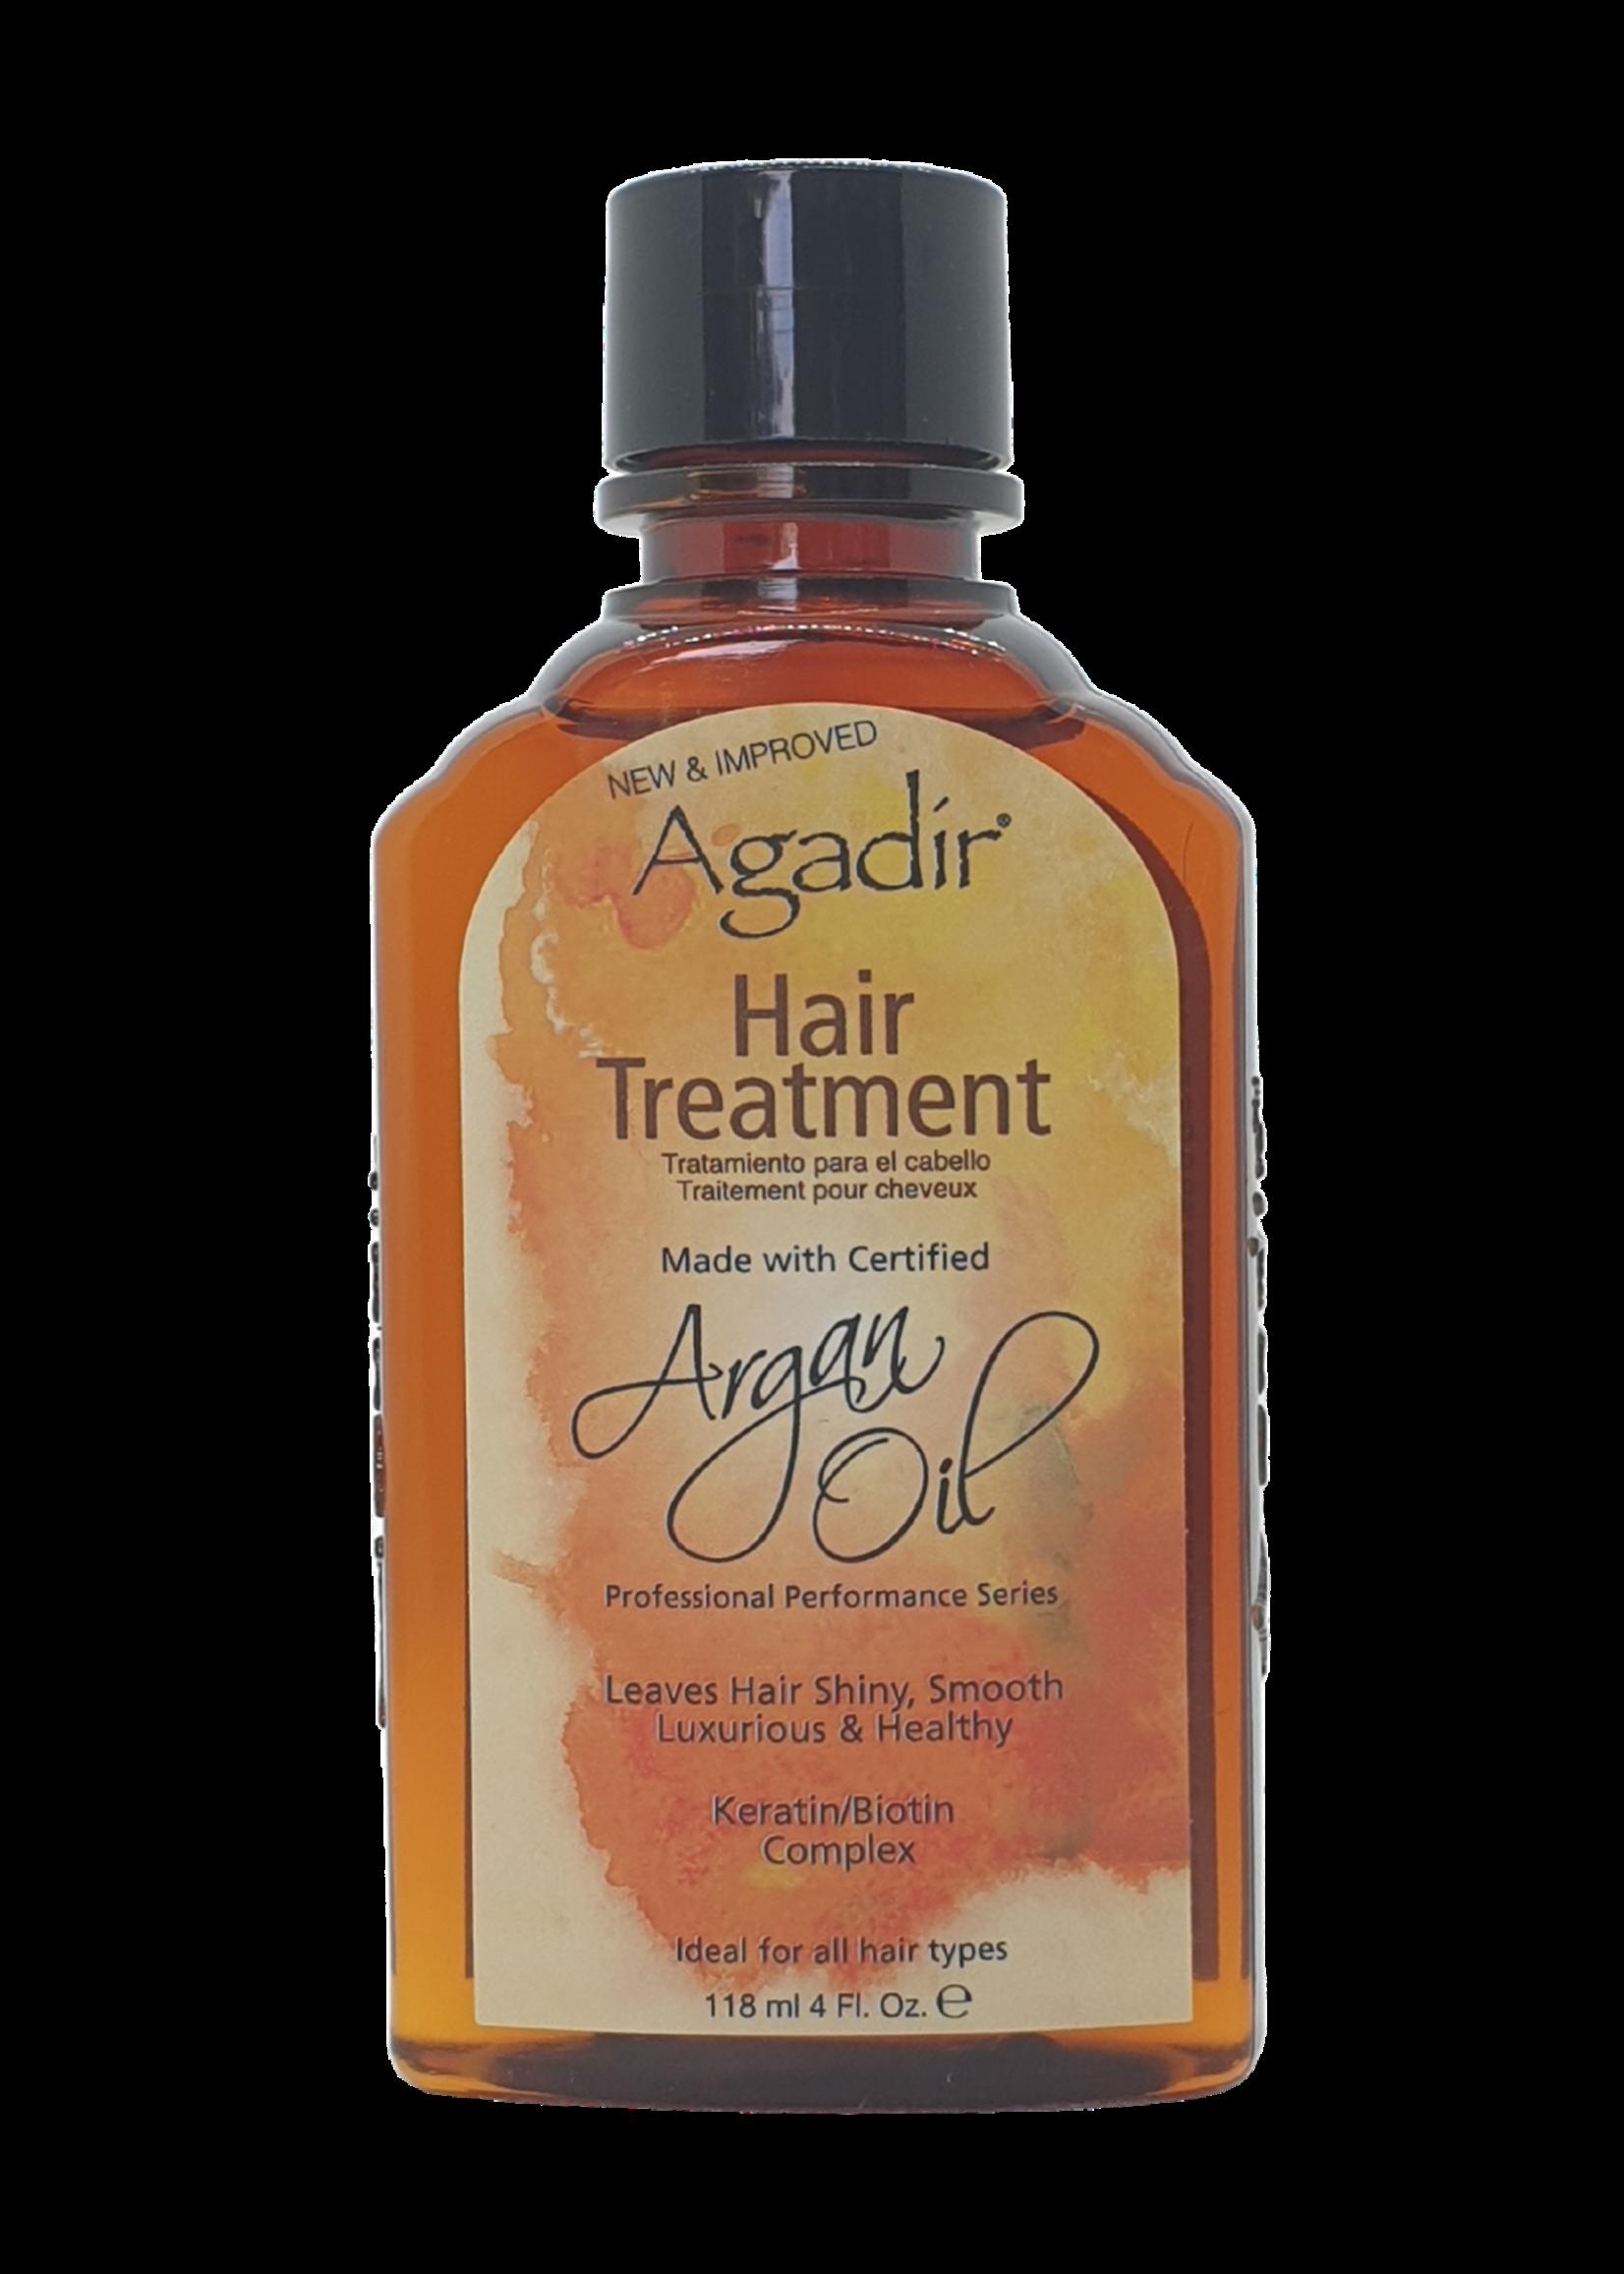 Agadir Agadir Argan Oil Hair Treatment 118ml